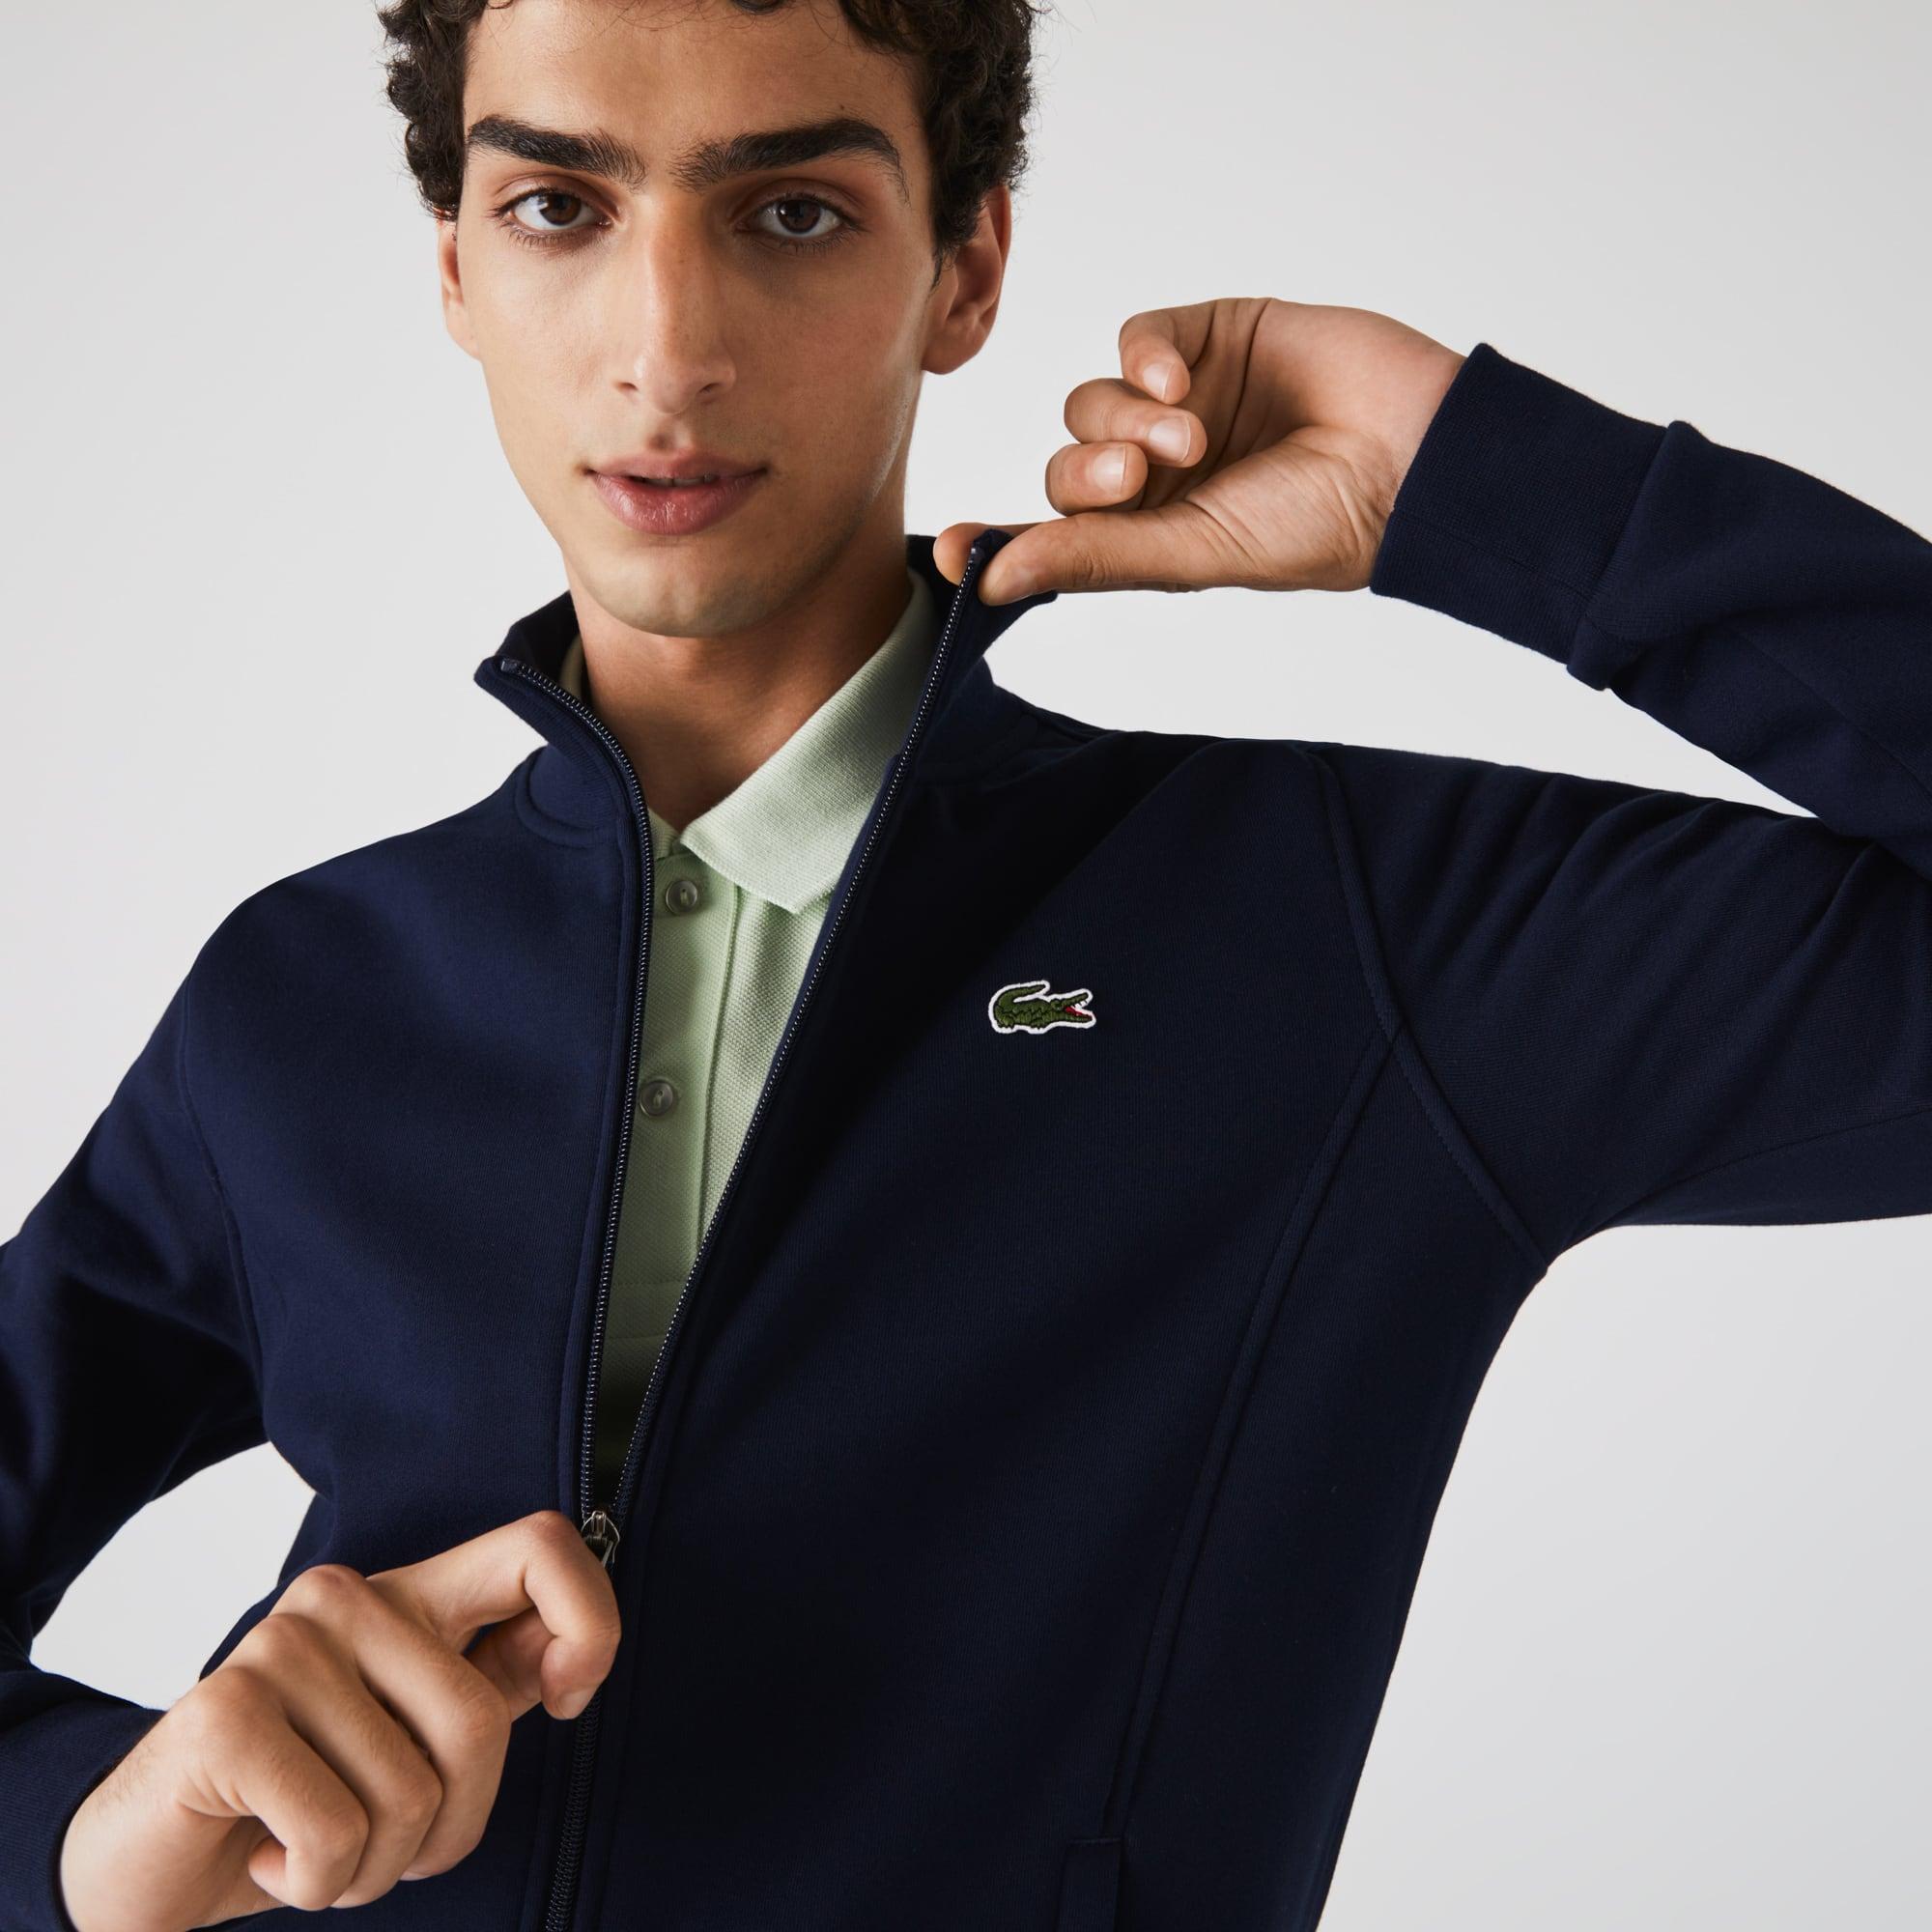 907a7cd7 Men's Lacoste SPORT zip-up fleece sweatshirt | LACOSTE